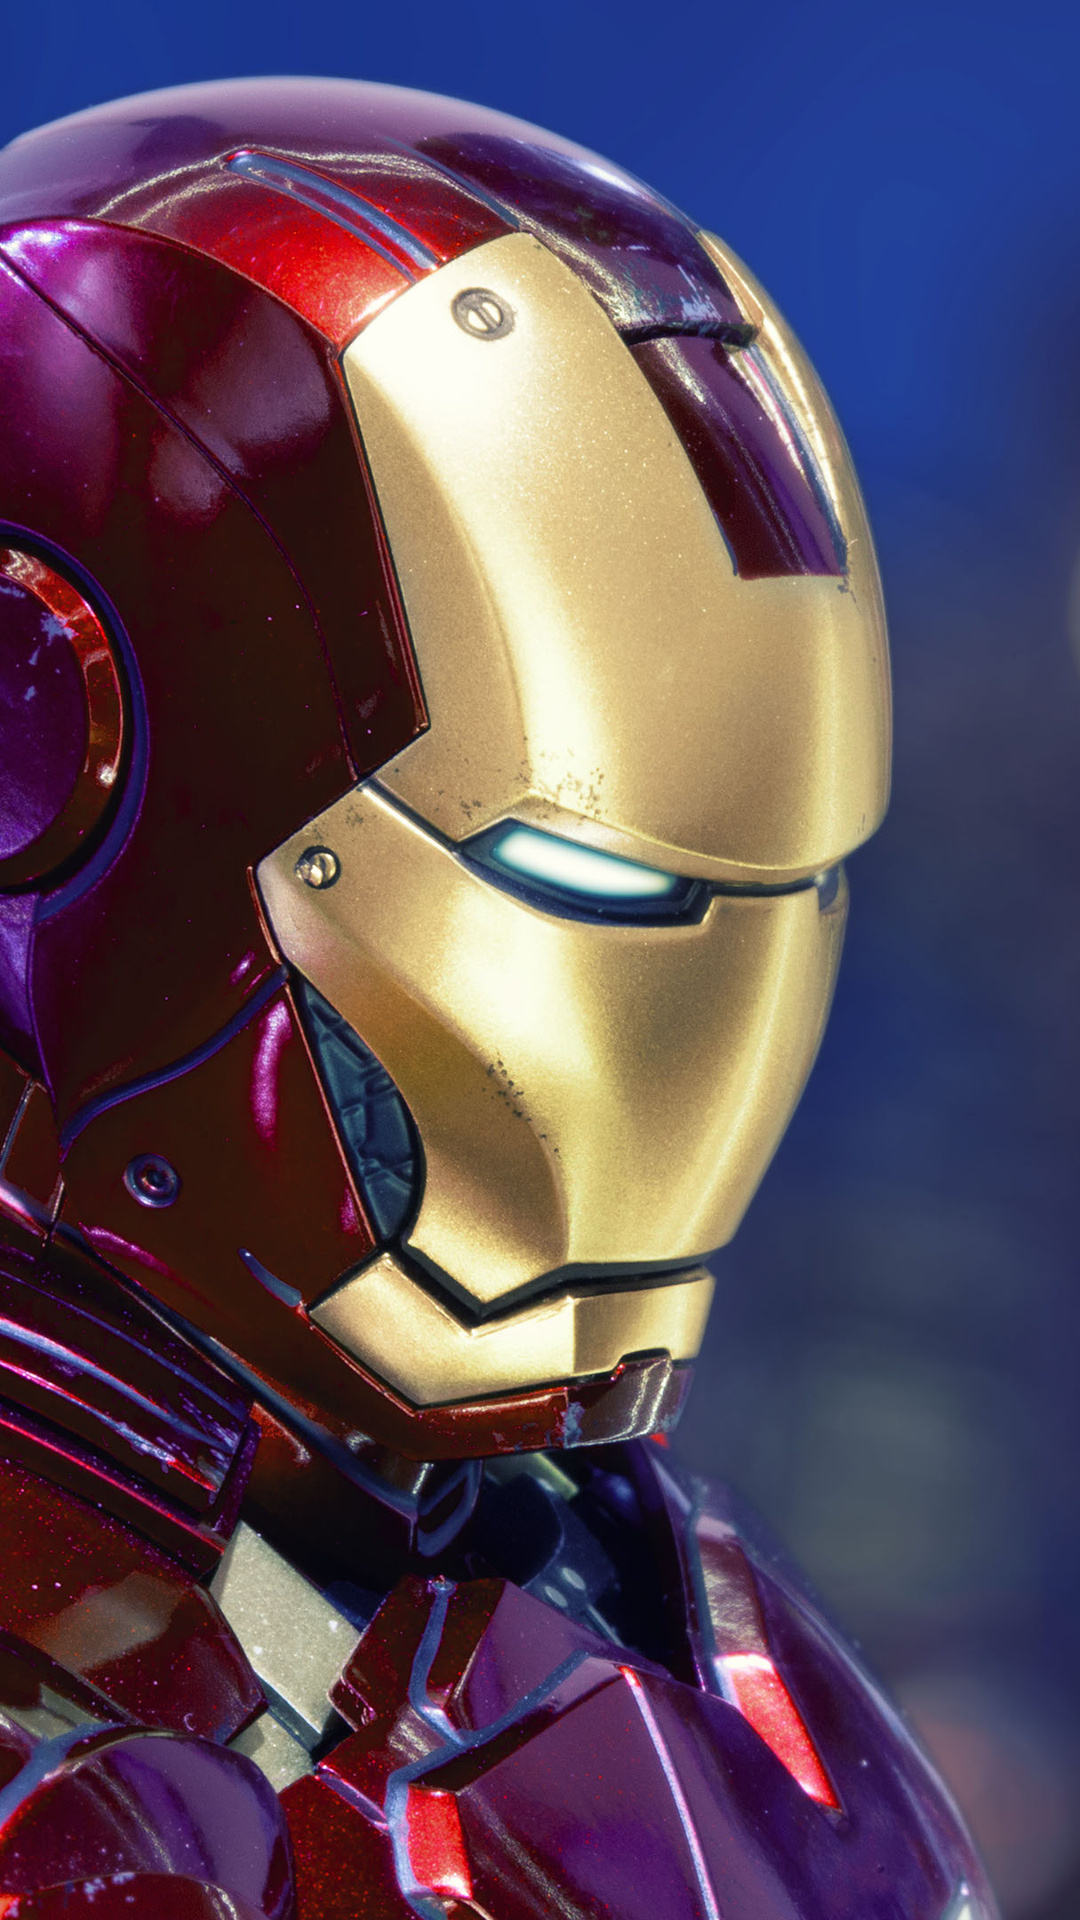 iron-man4k-yc.jpg